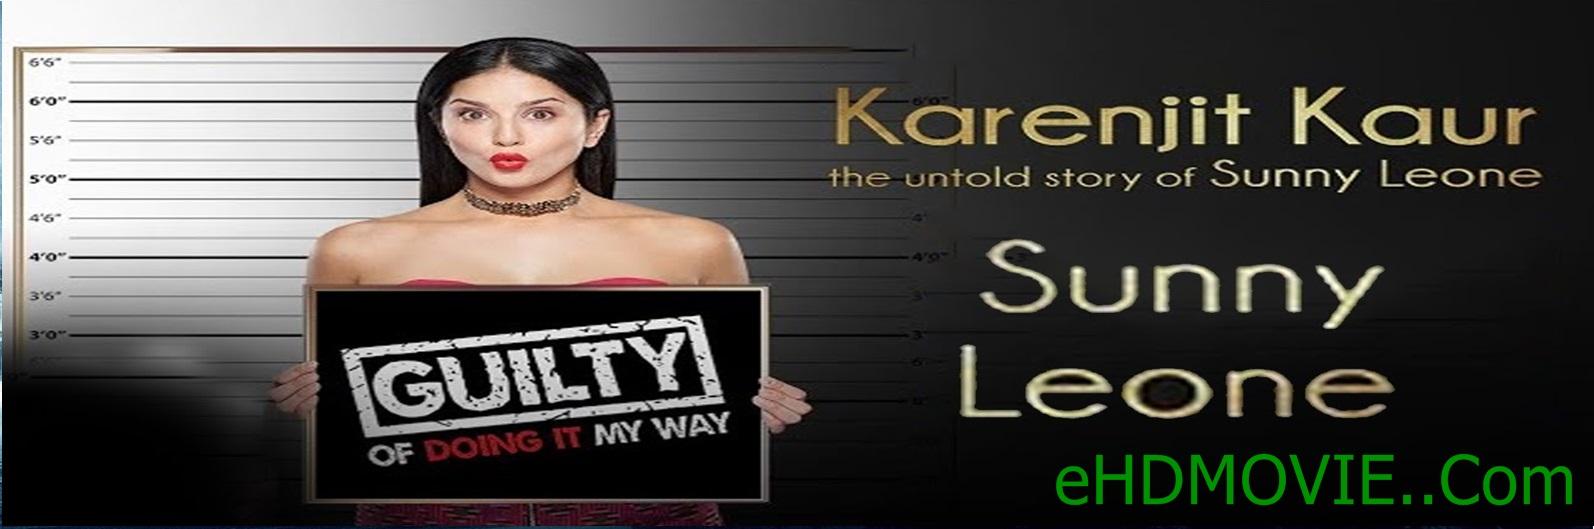 Karenjit Kaur The Untold Story of Sunny Leone (2018) Season 1 Complete 720p WEB-DL Hindi ESubs